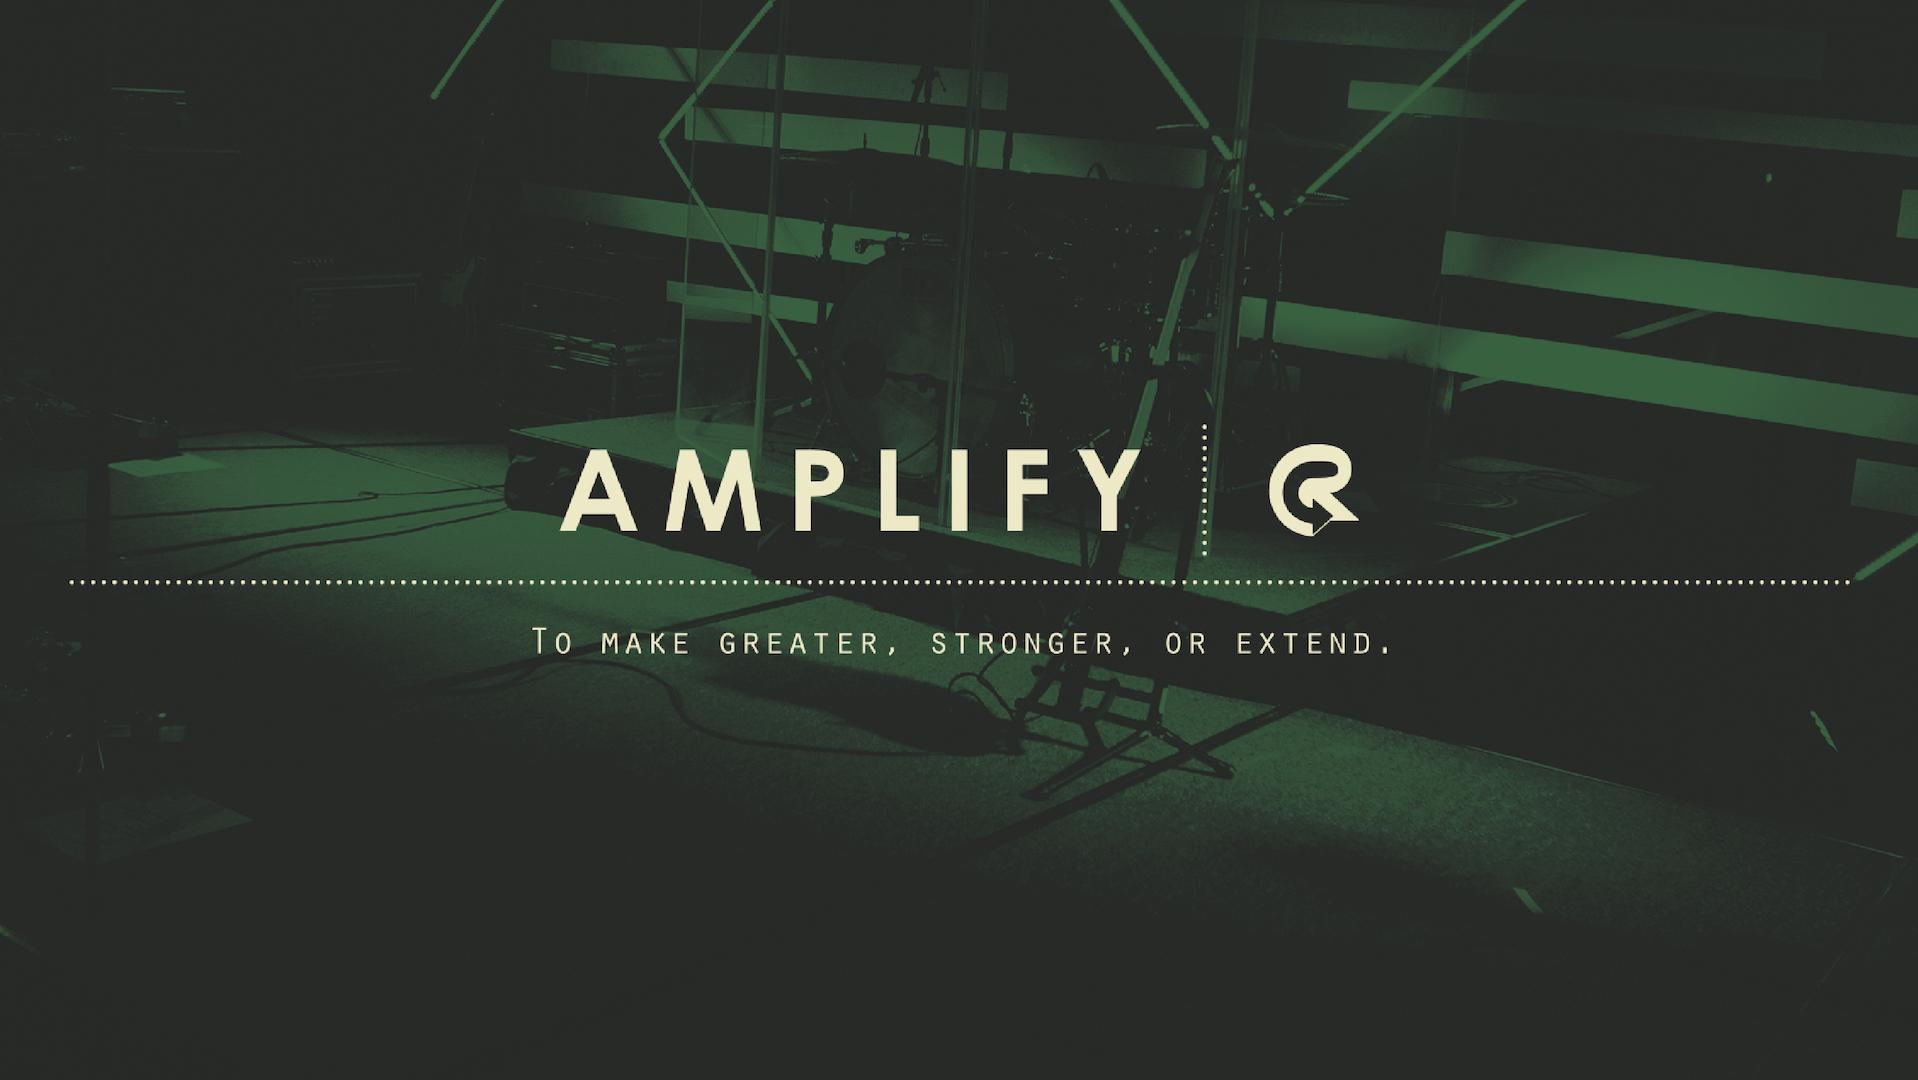 amp_meeting_post_front.jpg